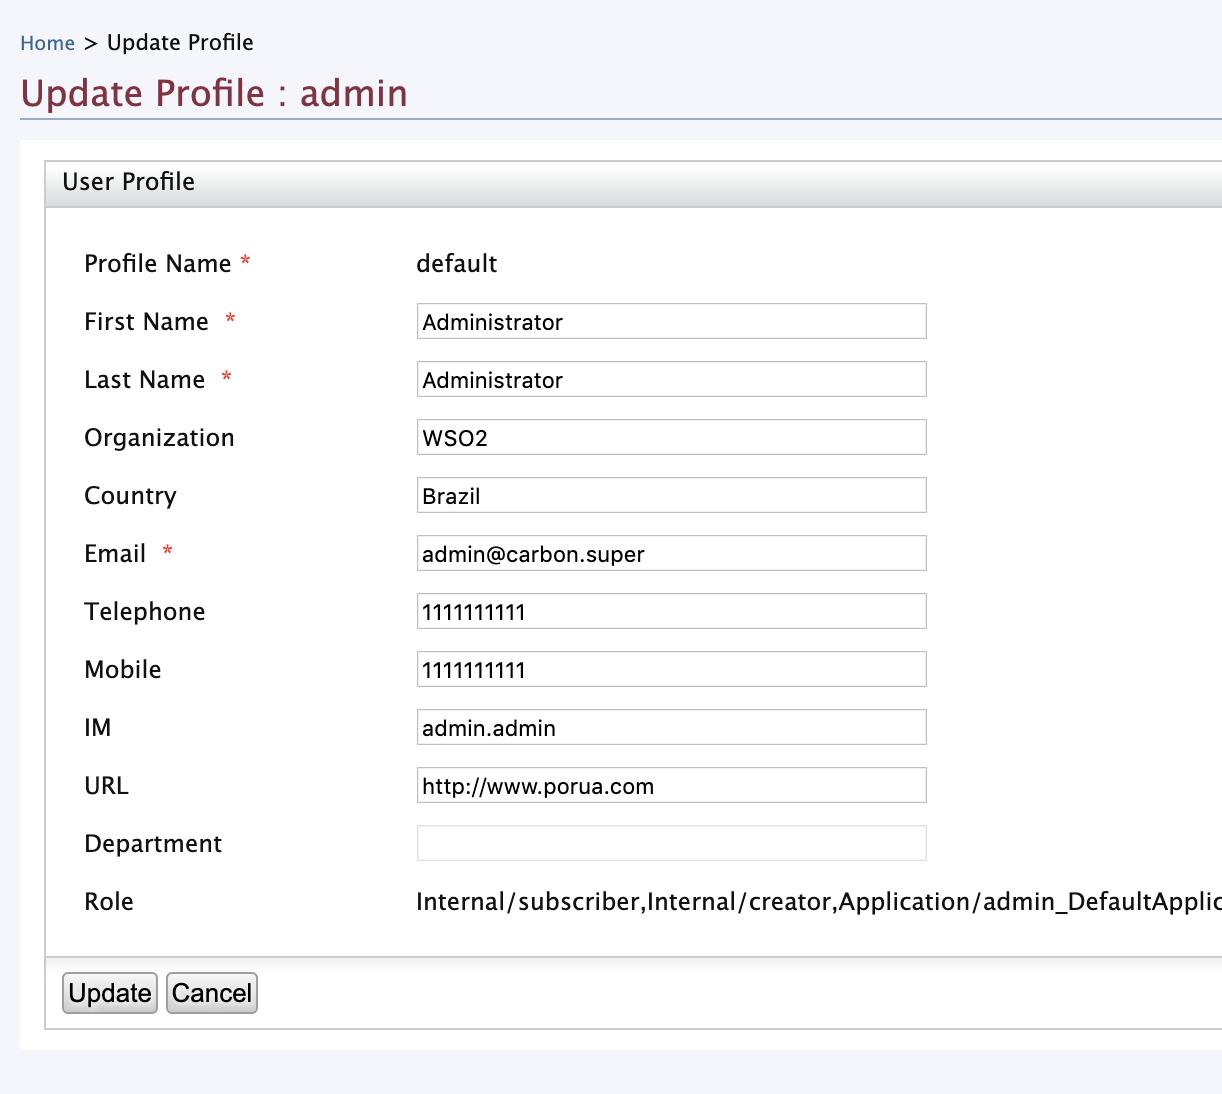 Updating Profile: admin